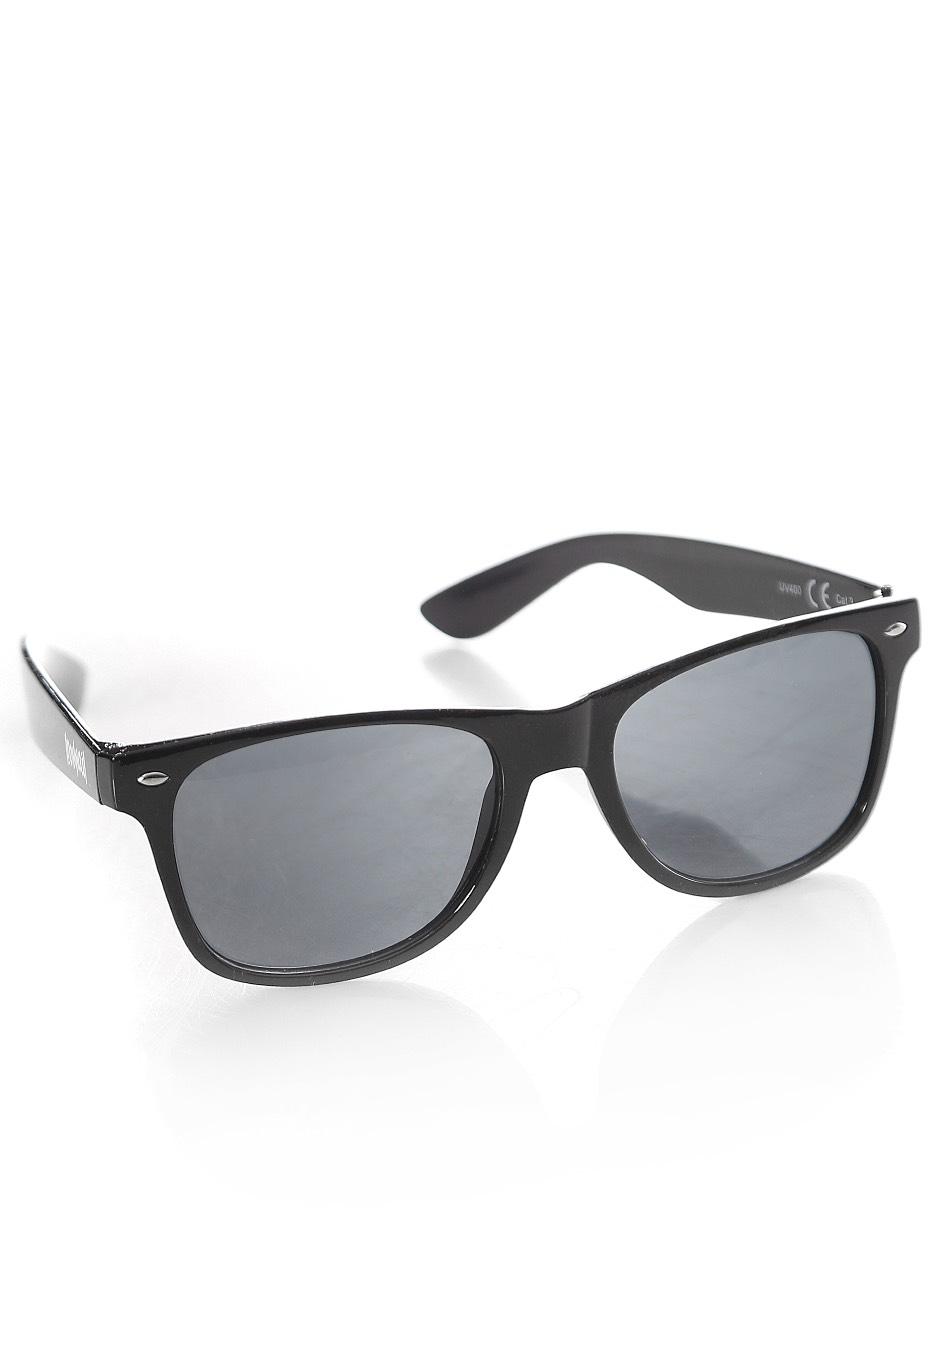 Ironnail - Logo - Sunglasses - Streetwear Shop - Impericon.com Worldwide ab4f331c70e50